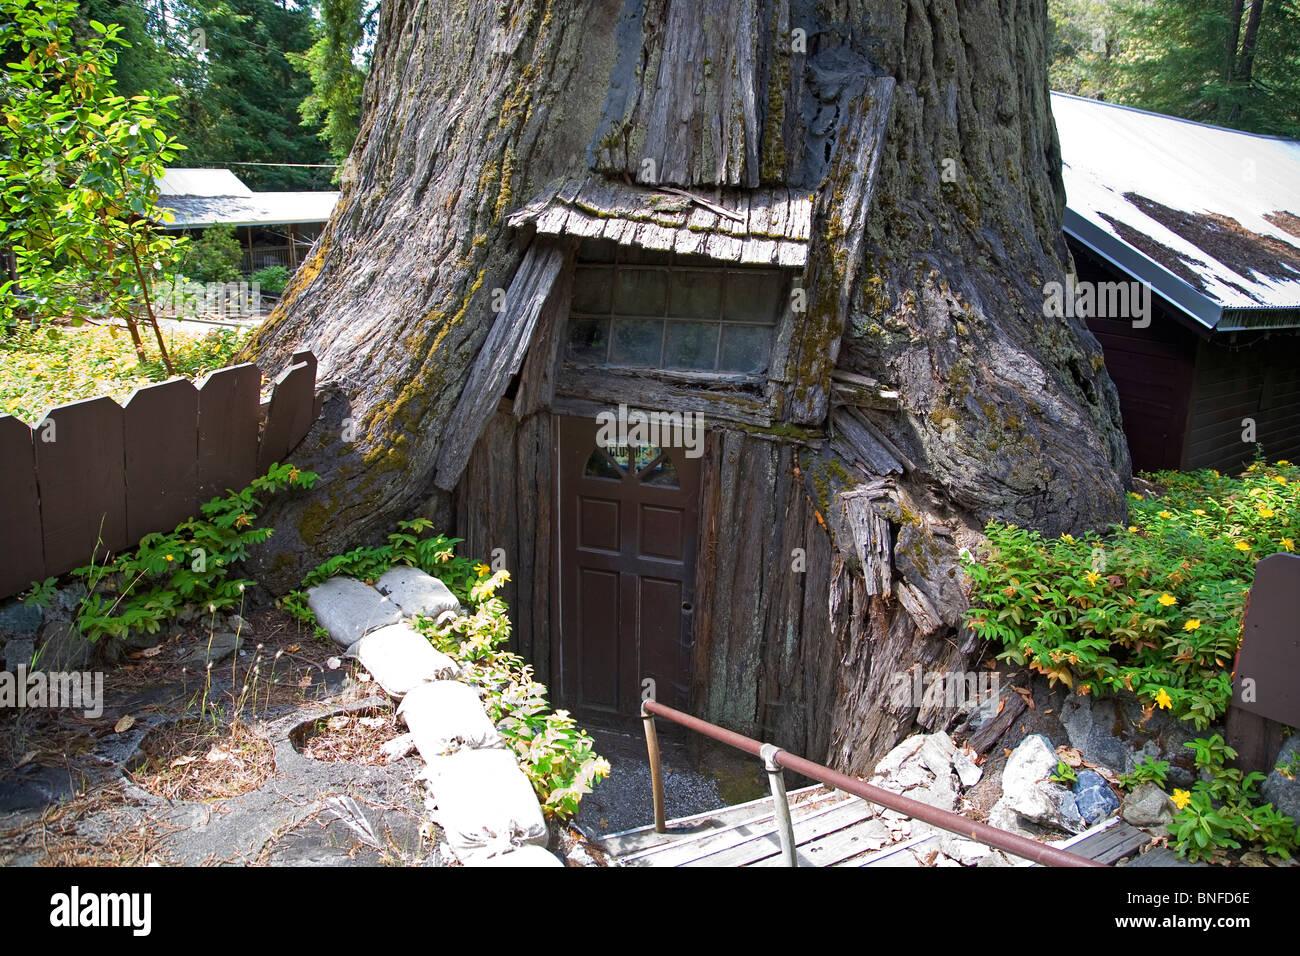 The Tree House A House Built Inside A Giant Redwood Tree